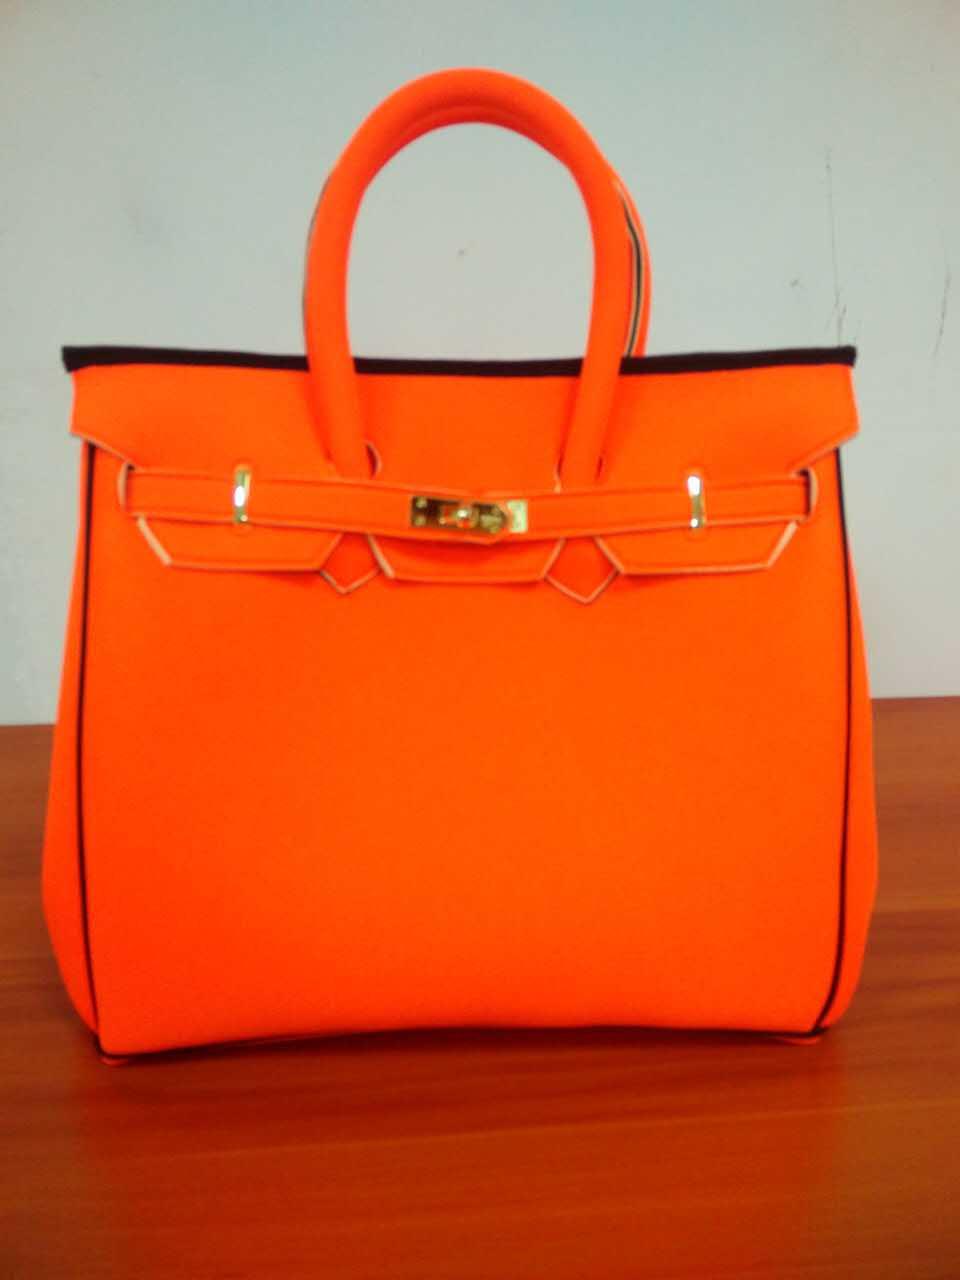 Fashion Light Weighted Neoprene Handbag